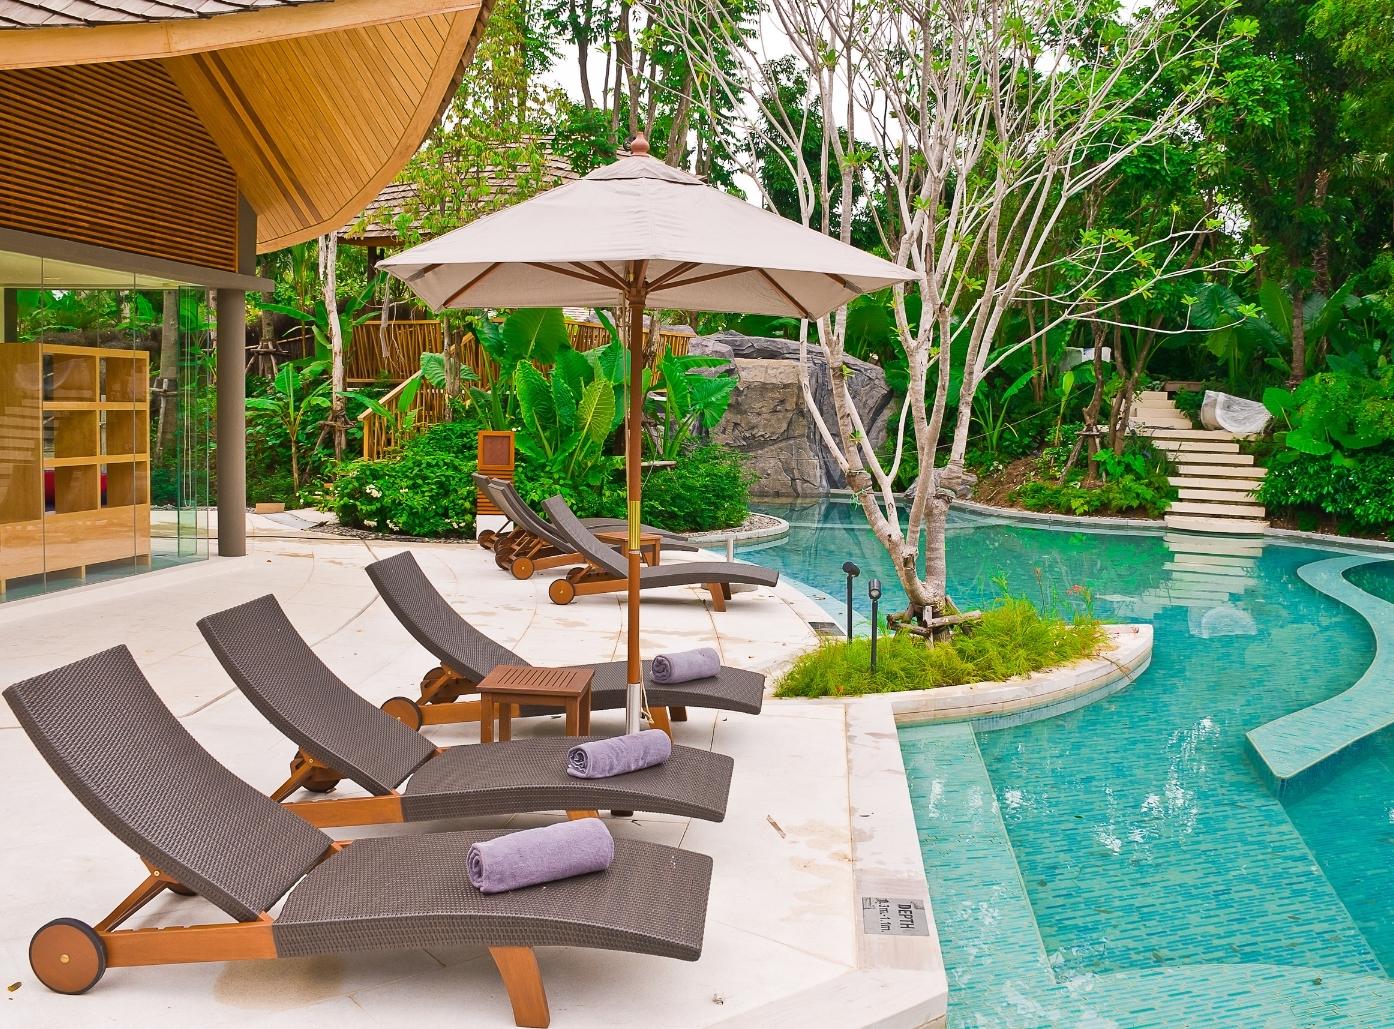 inspiring-home-exterior-decor-florida-designer-spectacular-spaces-38713891(1).jpg